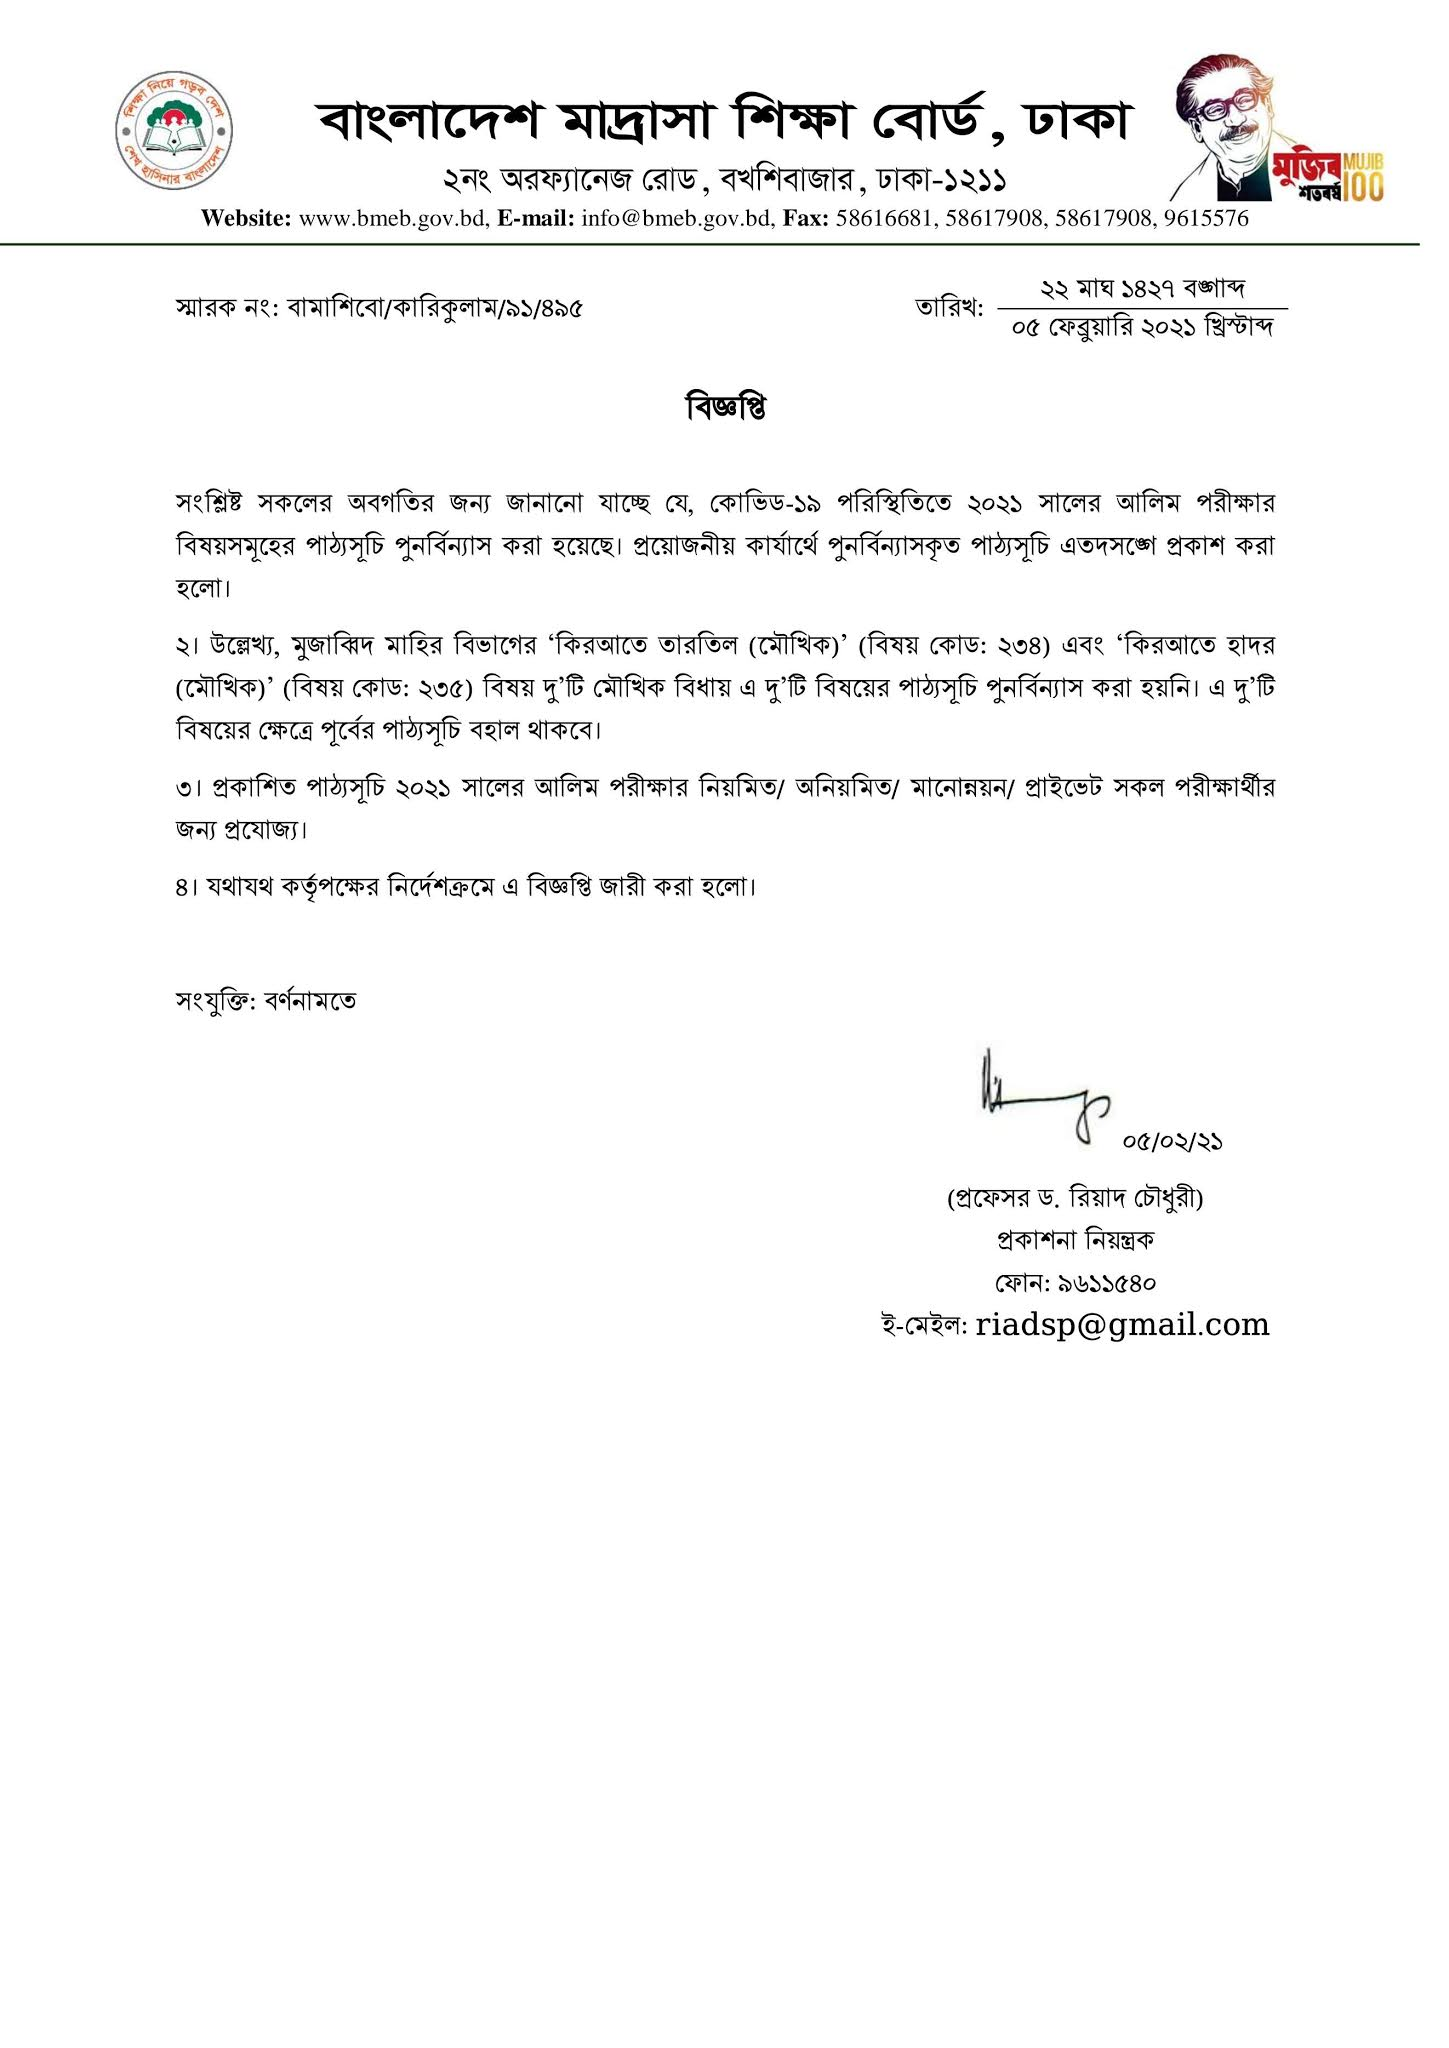 Alim Short Syllabus 2021 PDF Download -আলিম সংক্ষিপ্ত সিলেবাস ২০২১ PDF | আলিম পরীক্ষার সিলেবাস ২০২১